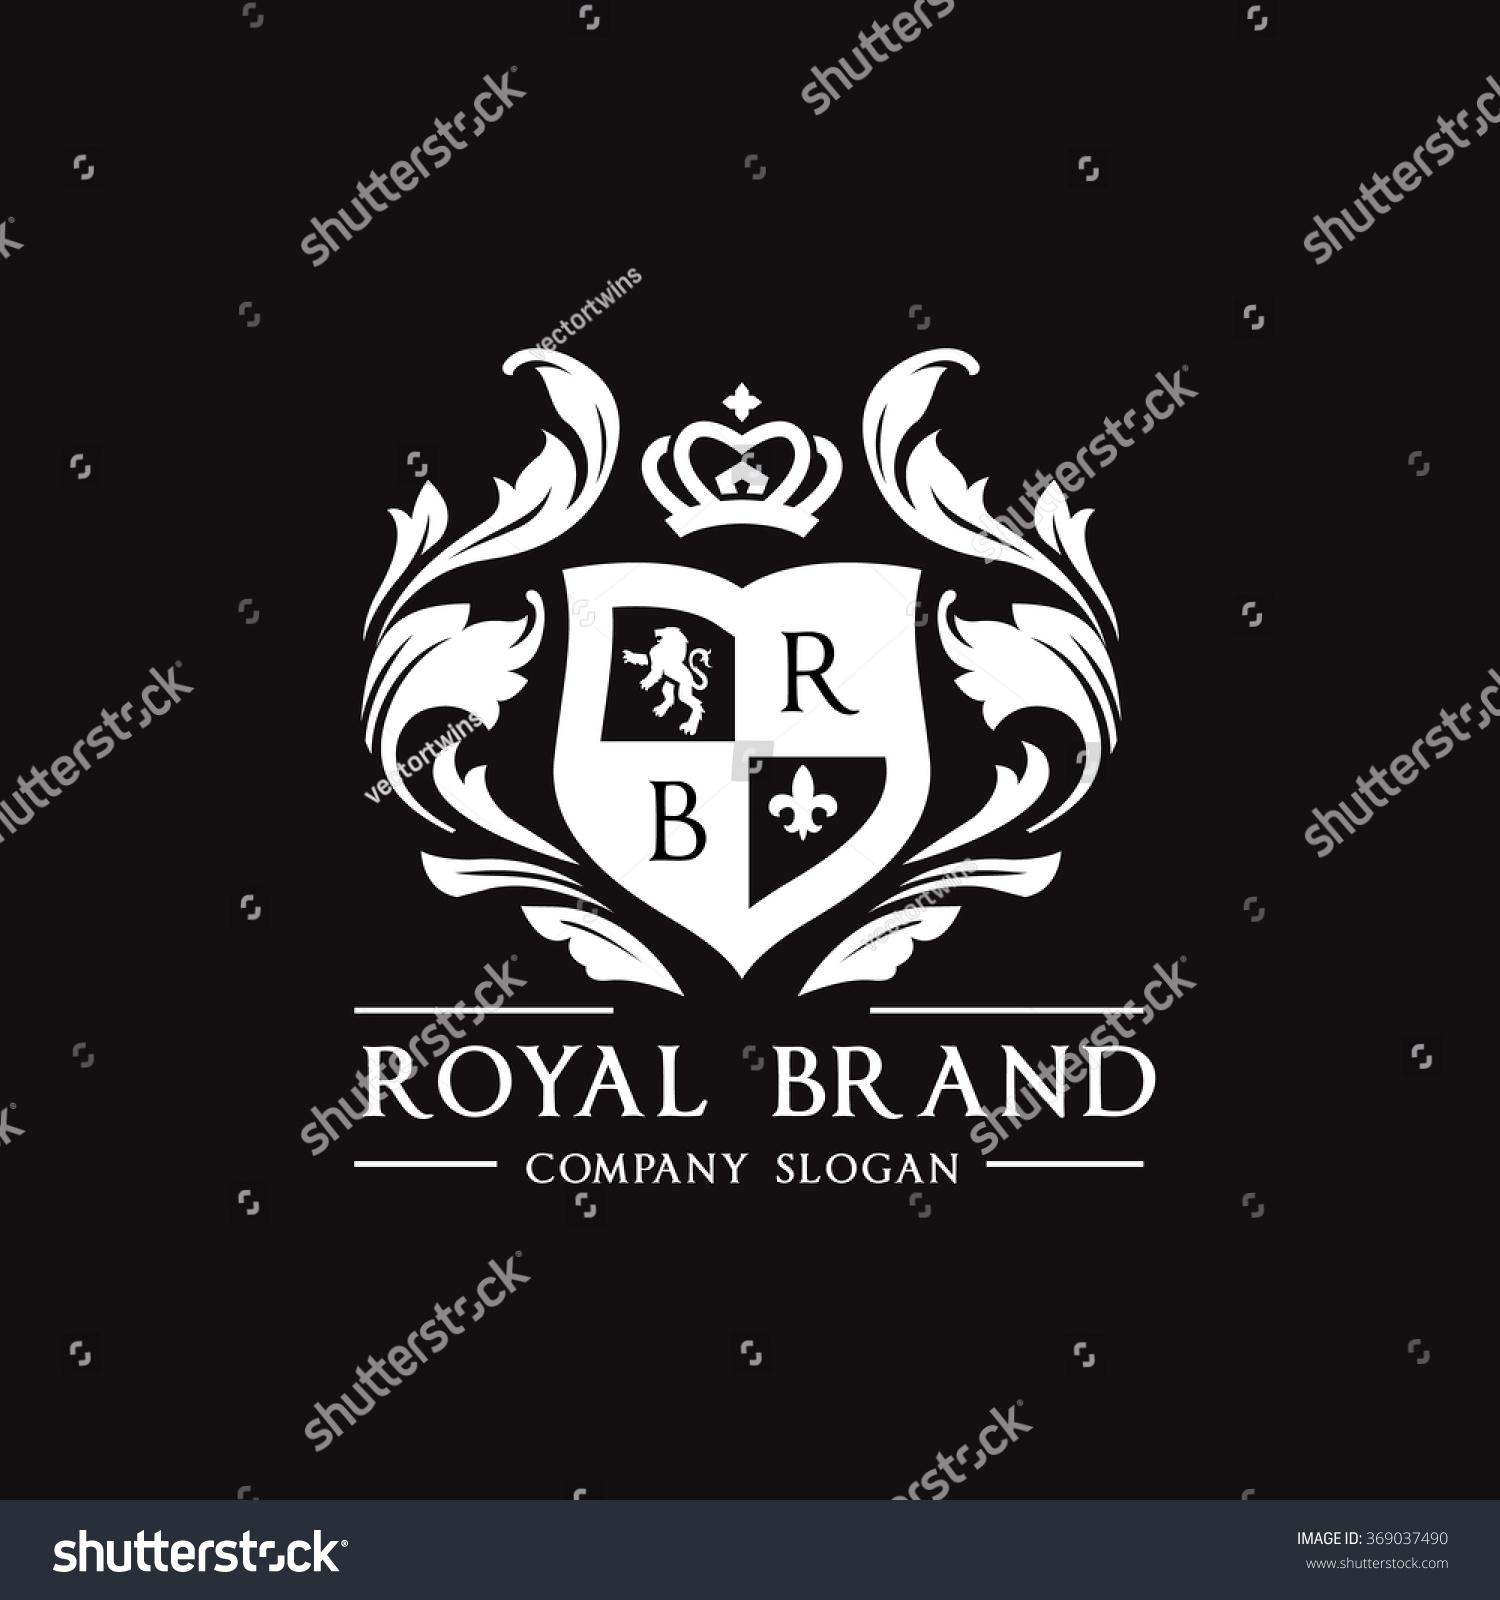 royal brand logocrown logolion logocrest logovector stock vector 369037490 shutterstock. Black Bedroom Furniture Sets. Home Design Ideas